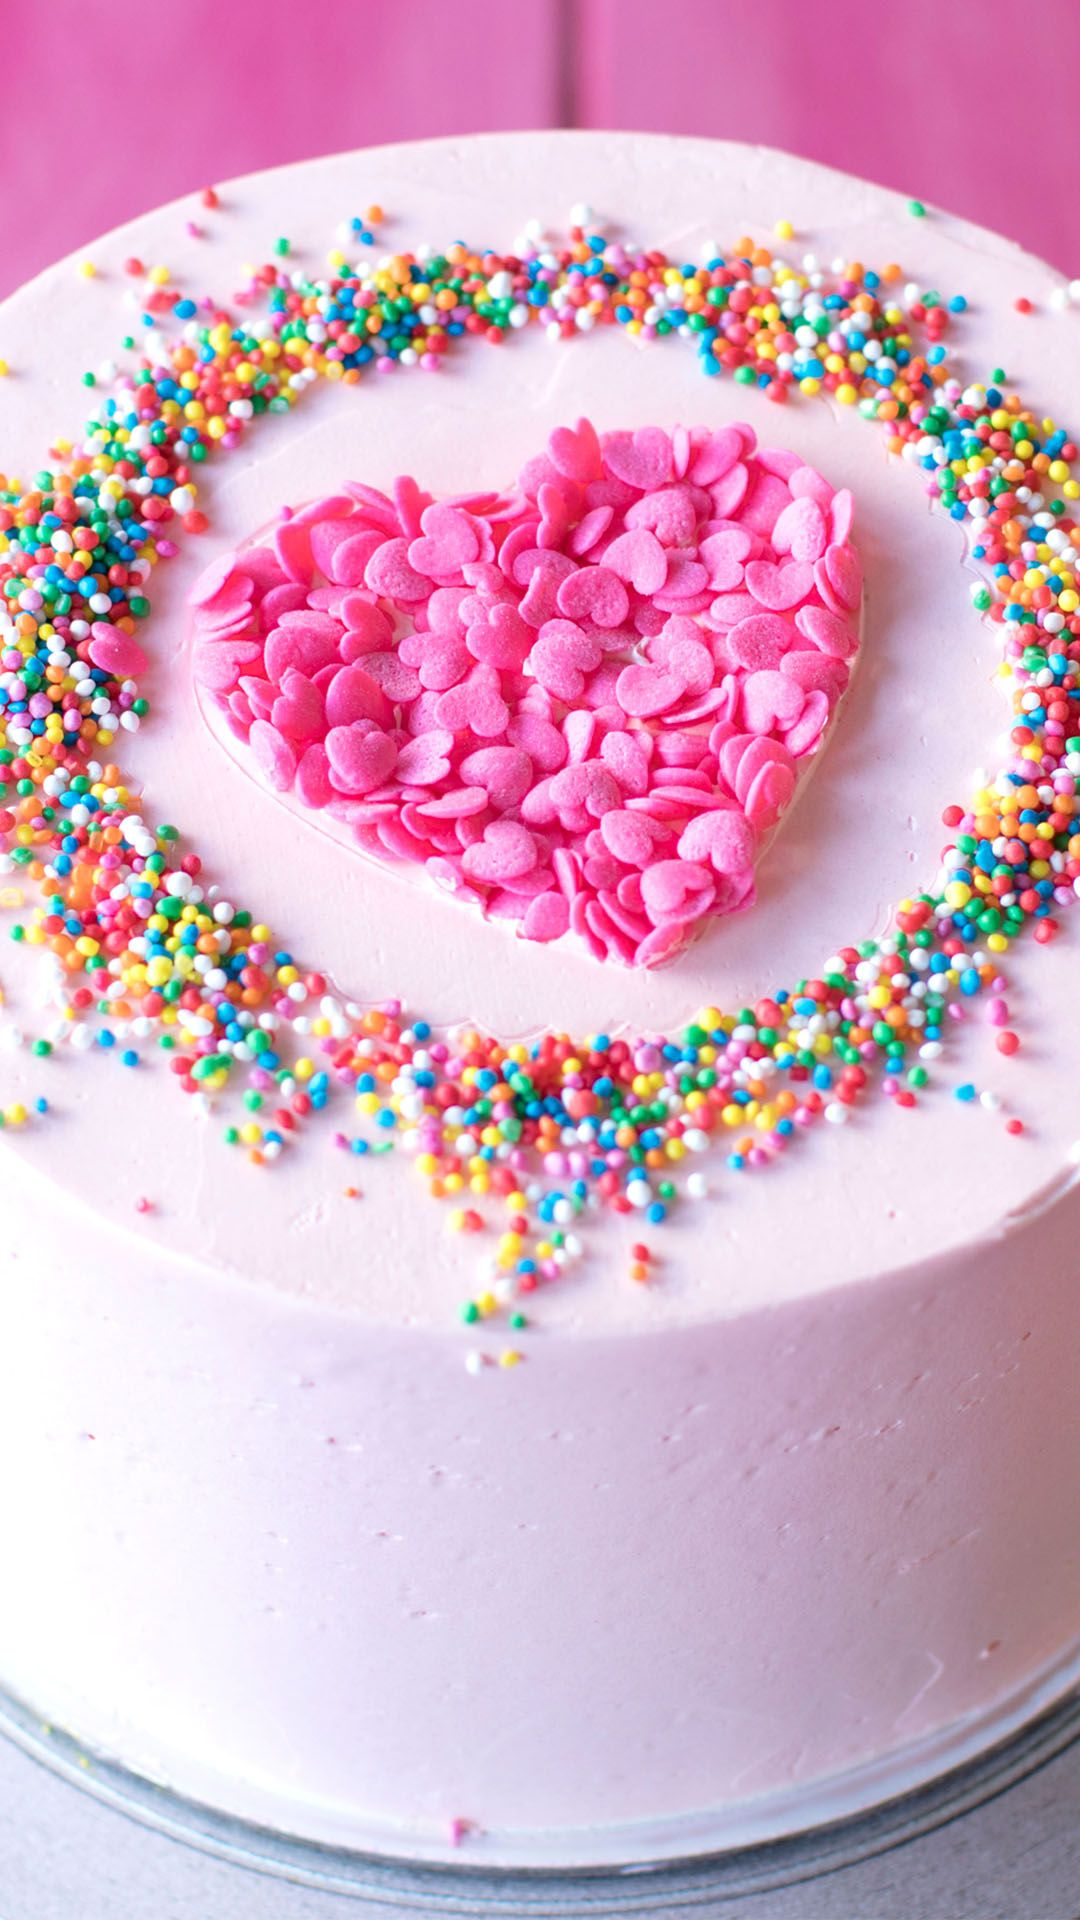 5 cake decorating hacks #cakedecoratingvideos